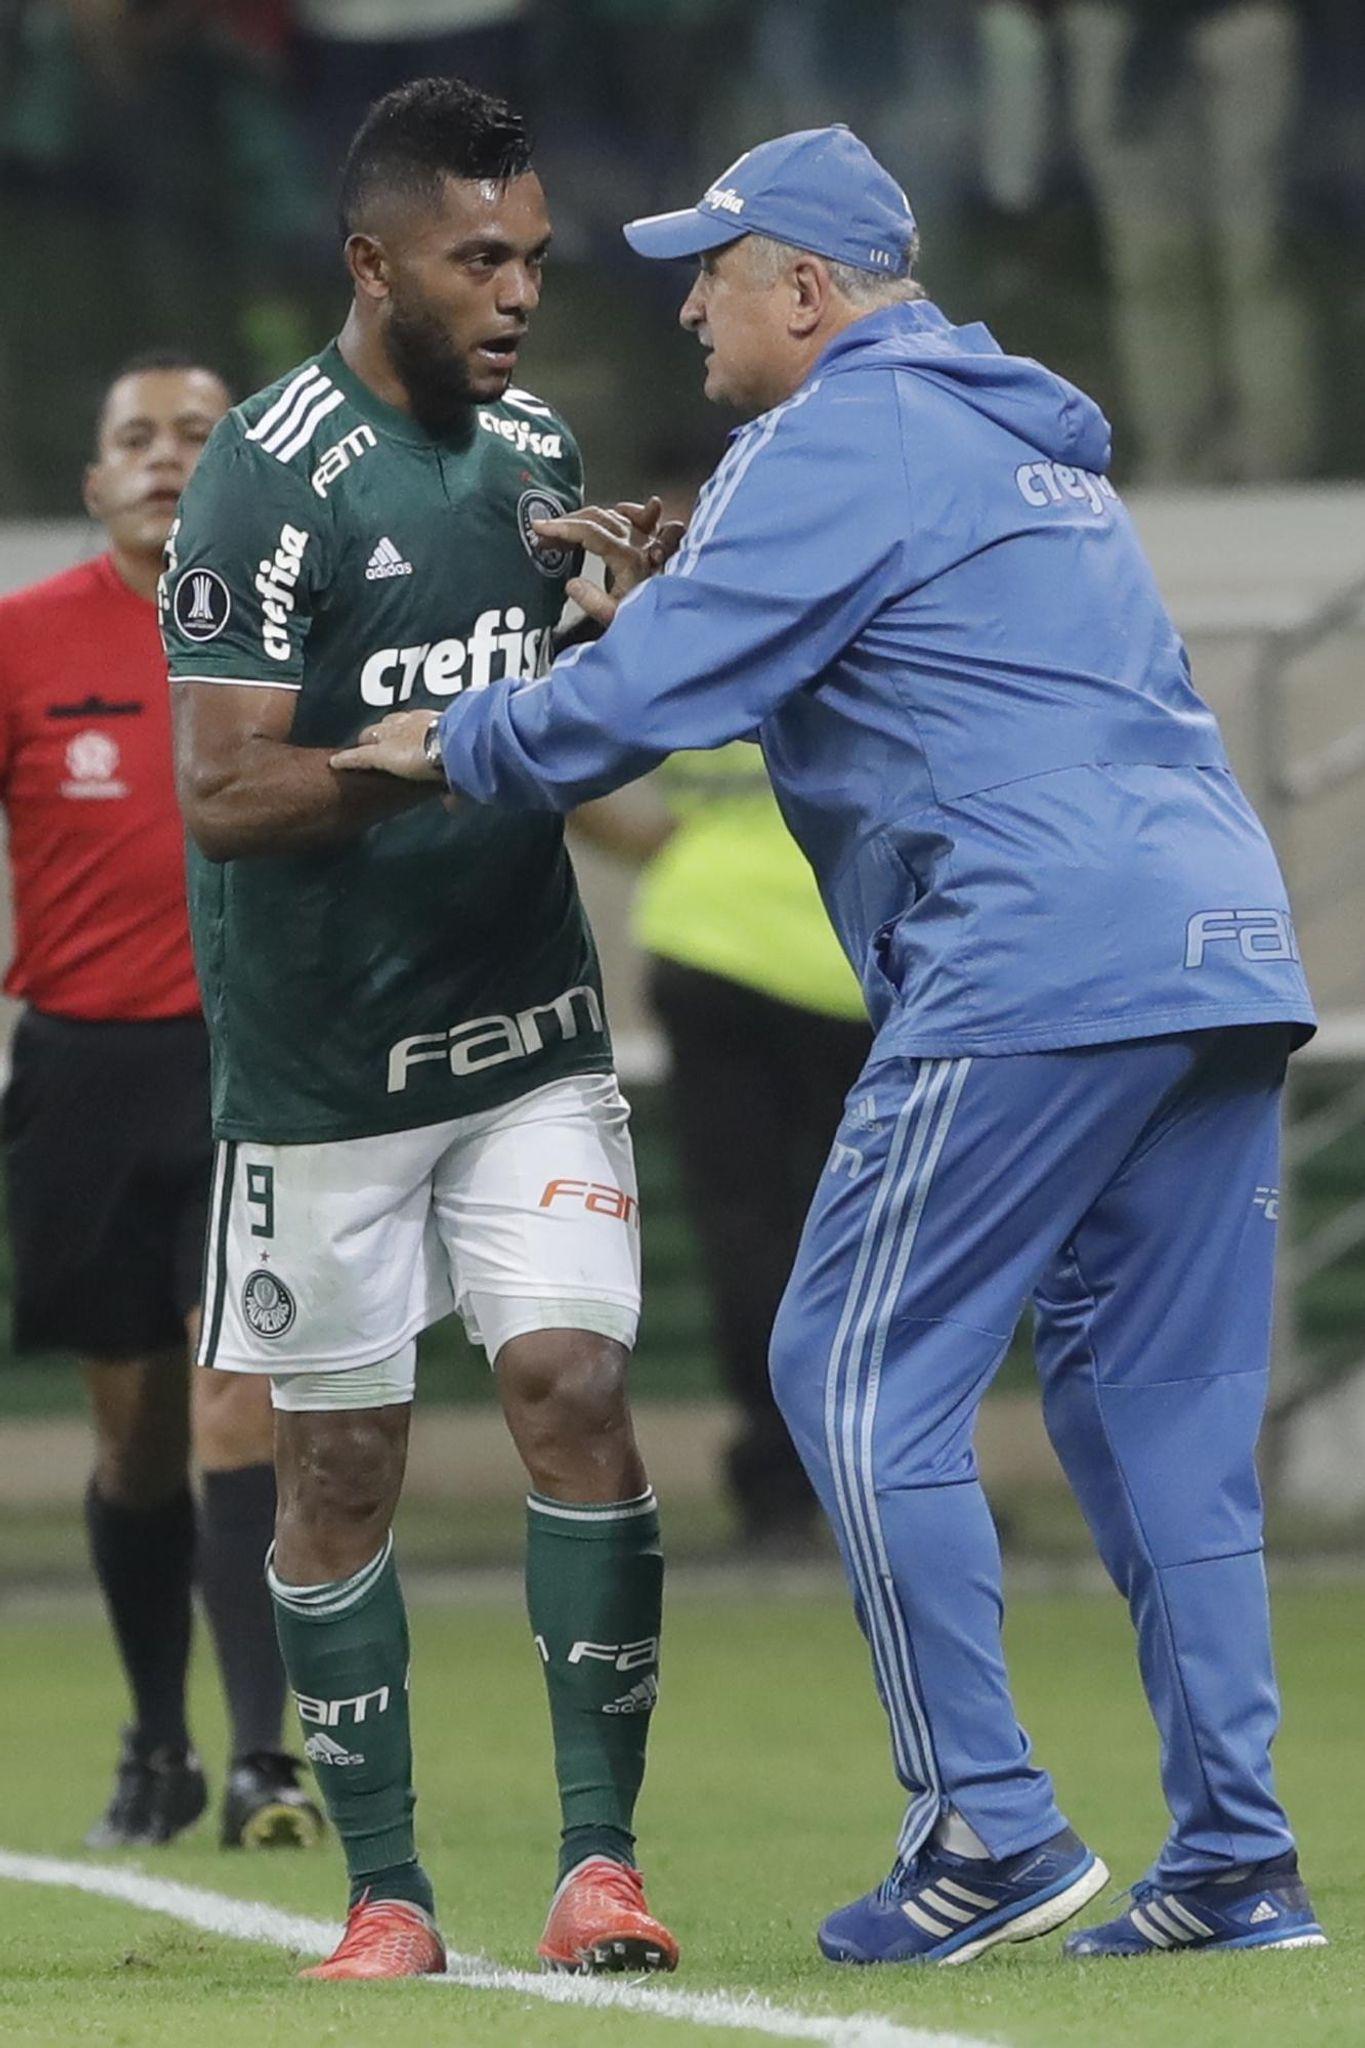 Brazil_chile_soccer_copa_libertadores_57694_s1365x2048